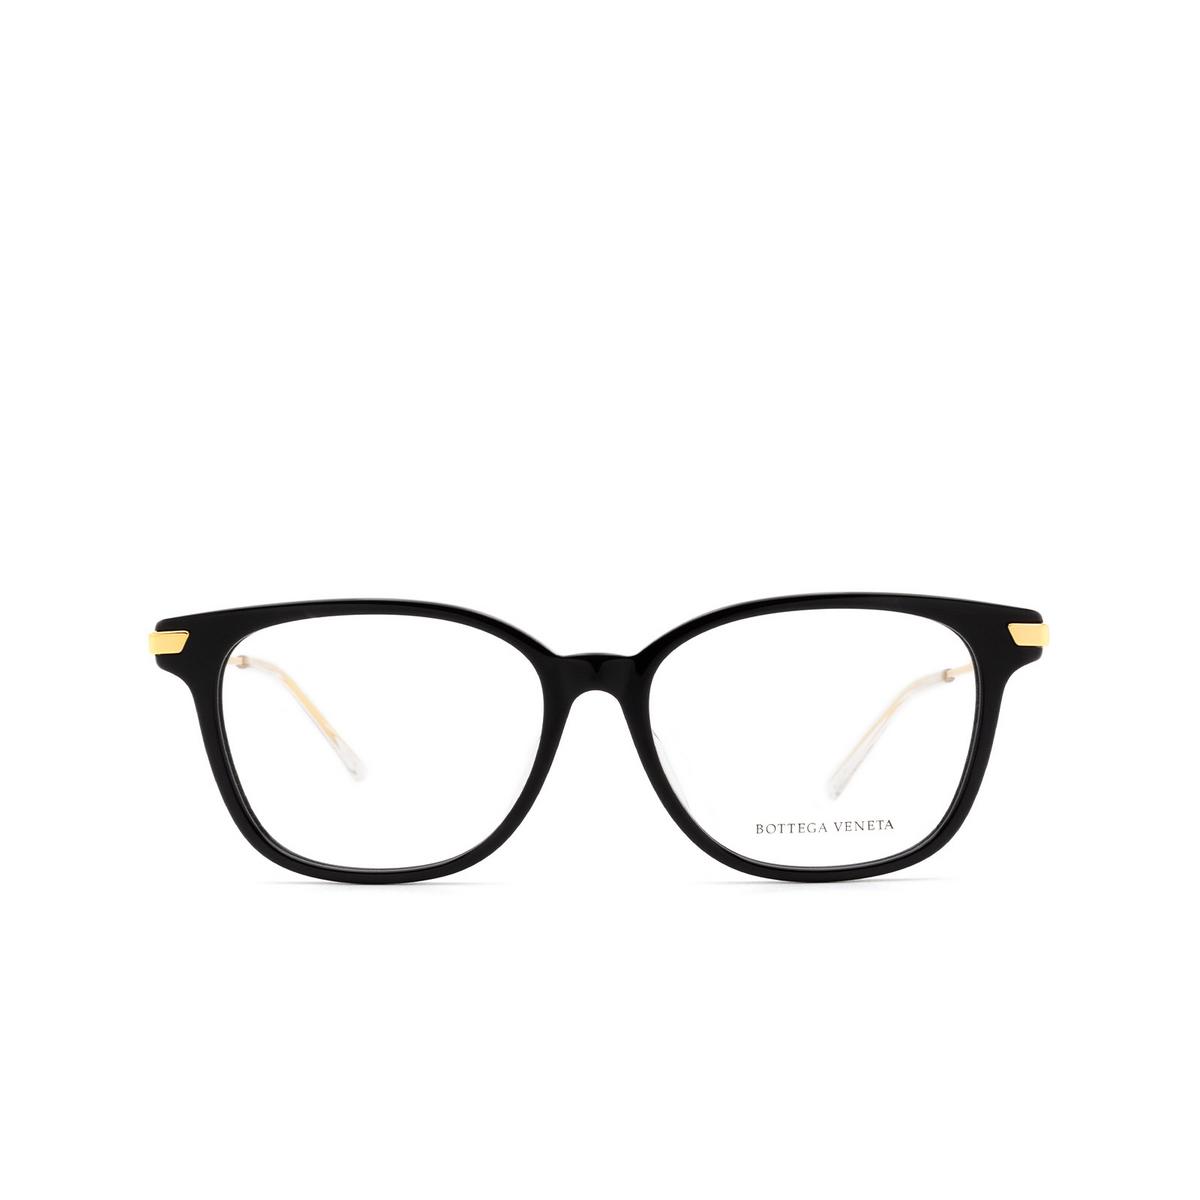 Bottega Veneta® Square Eyeglasses: BV1074OA color Black 001 - front view.